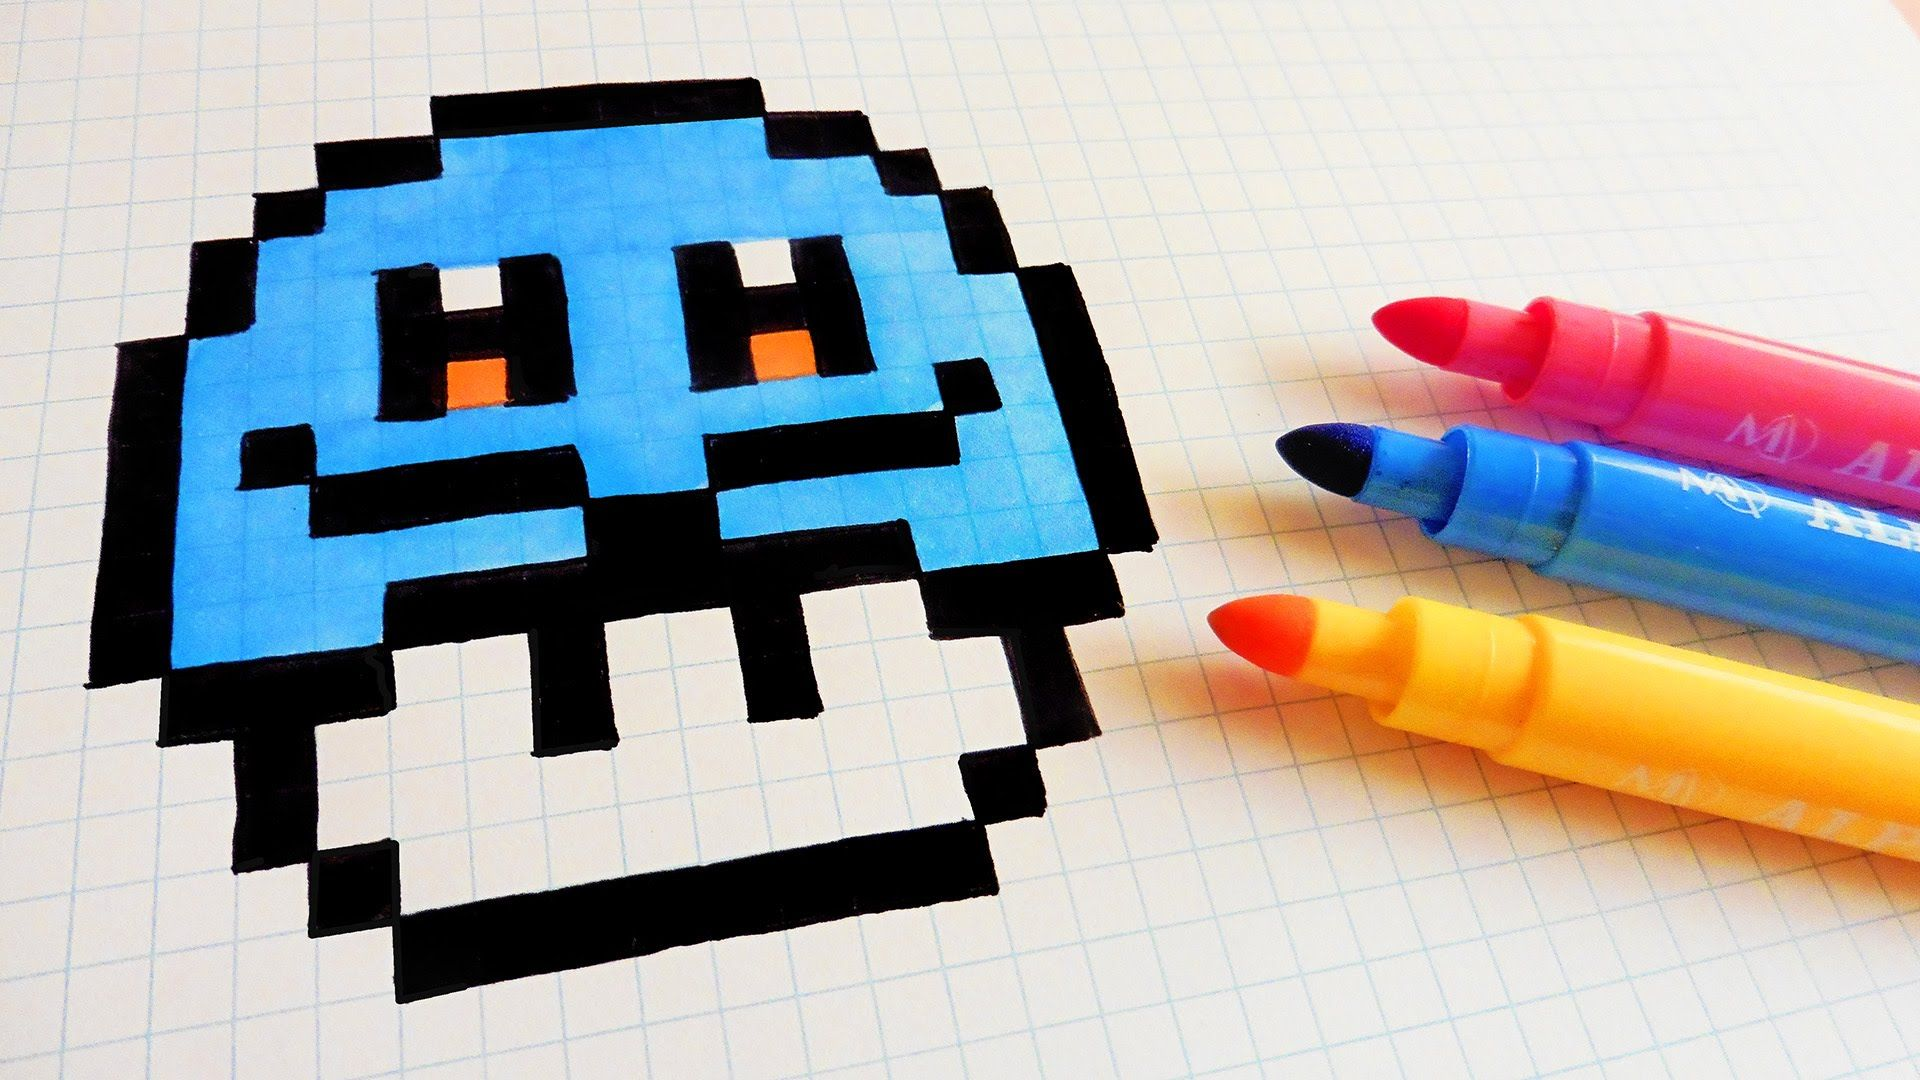 pixel art champignon